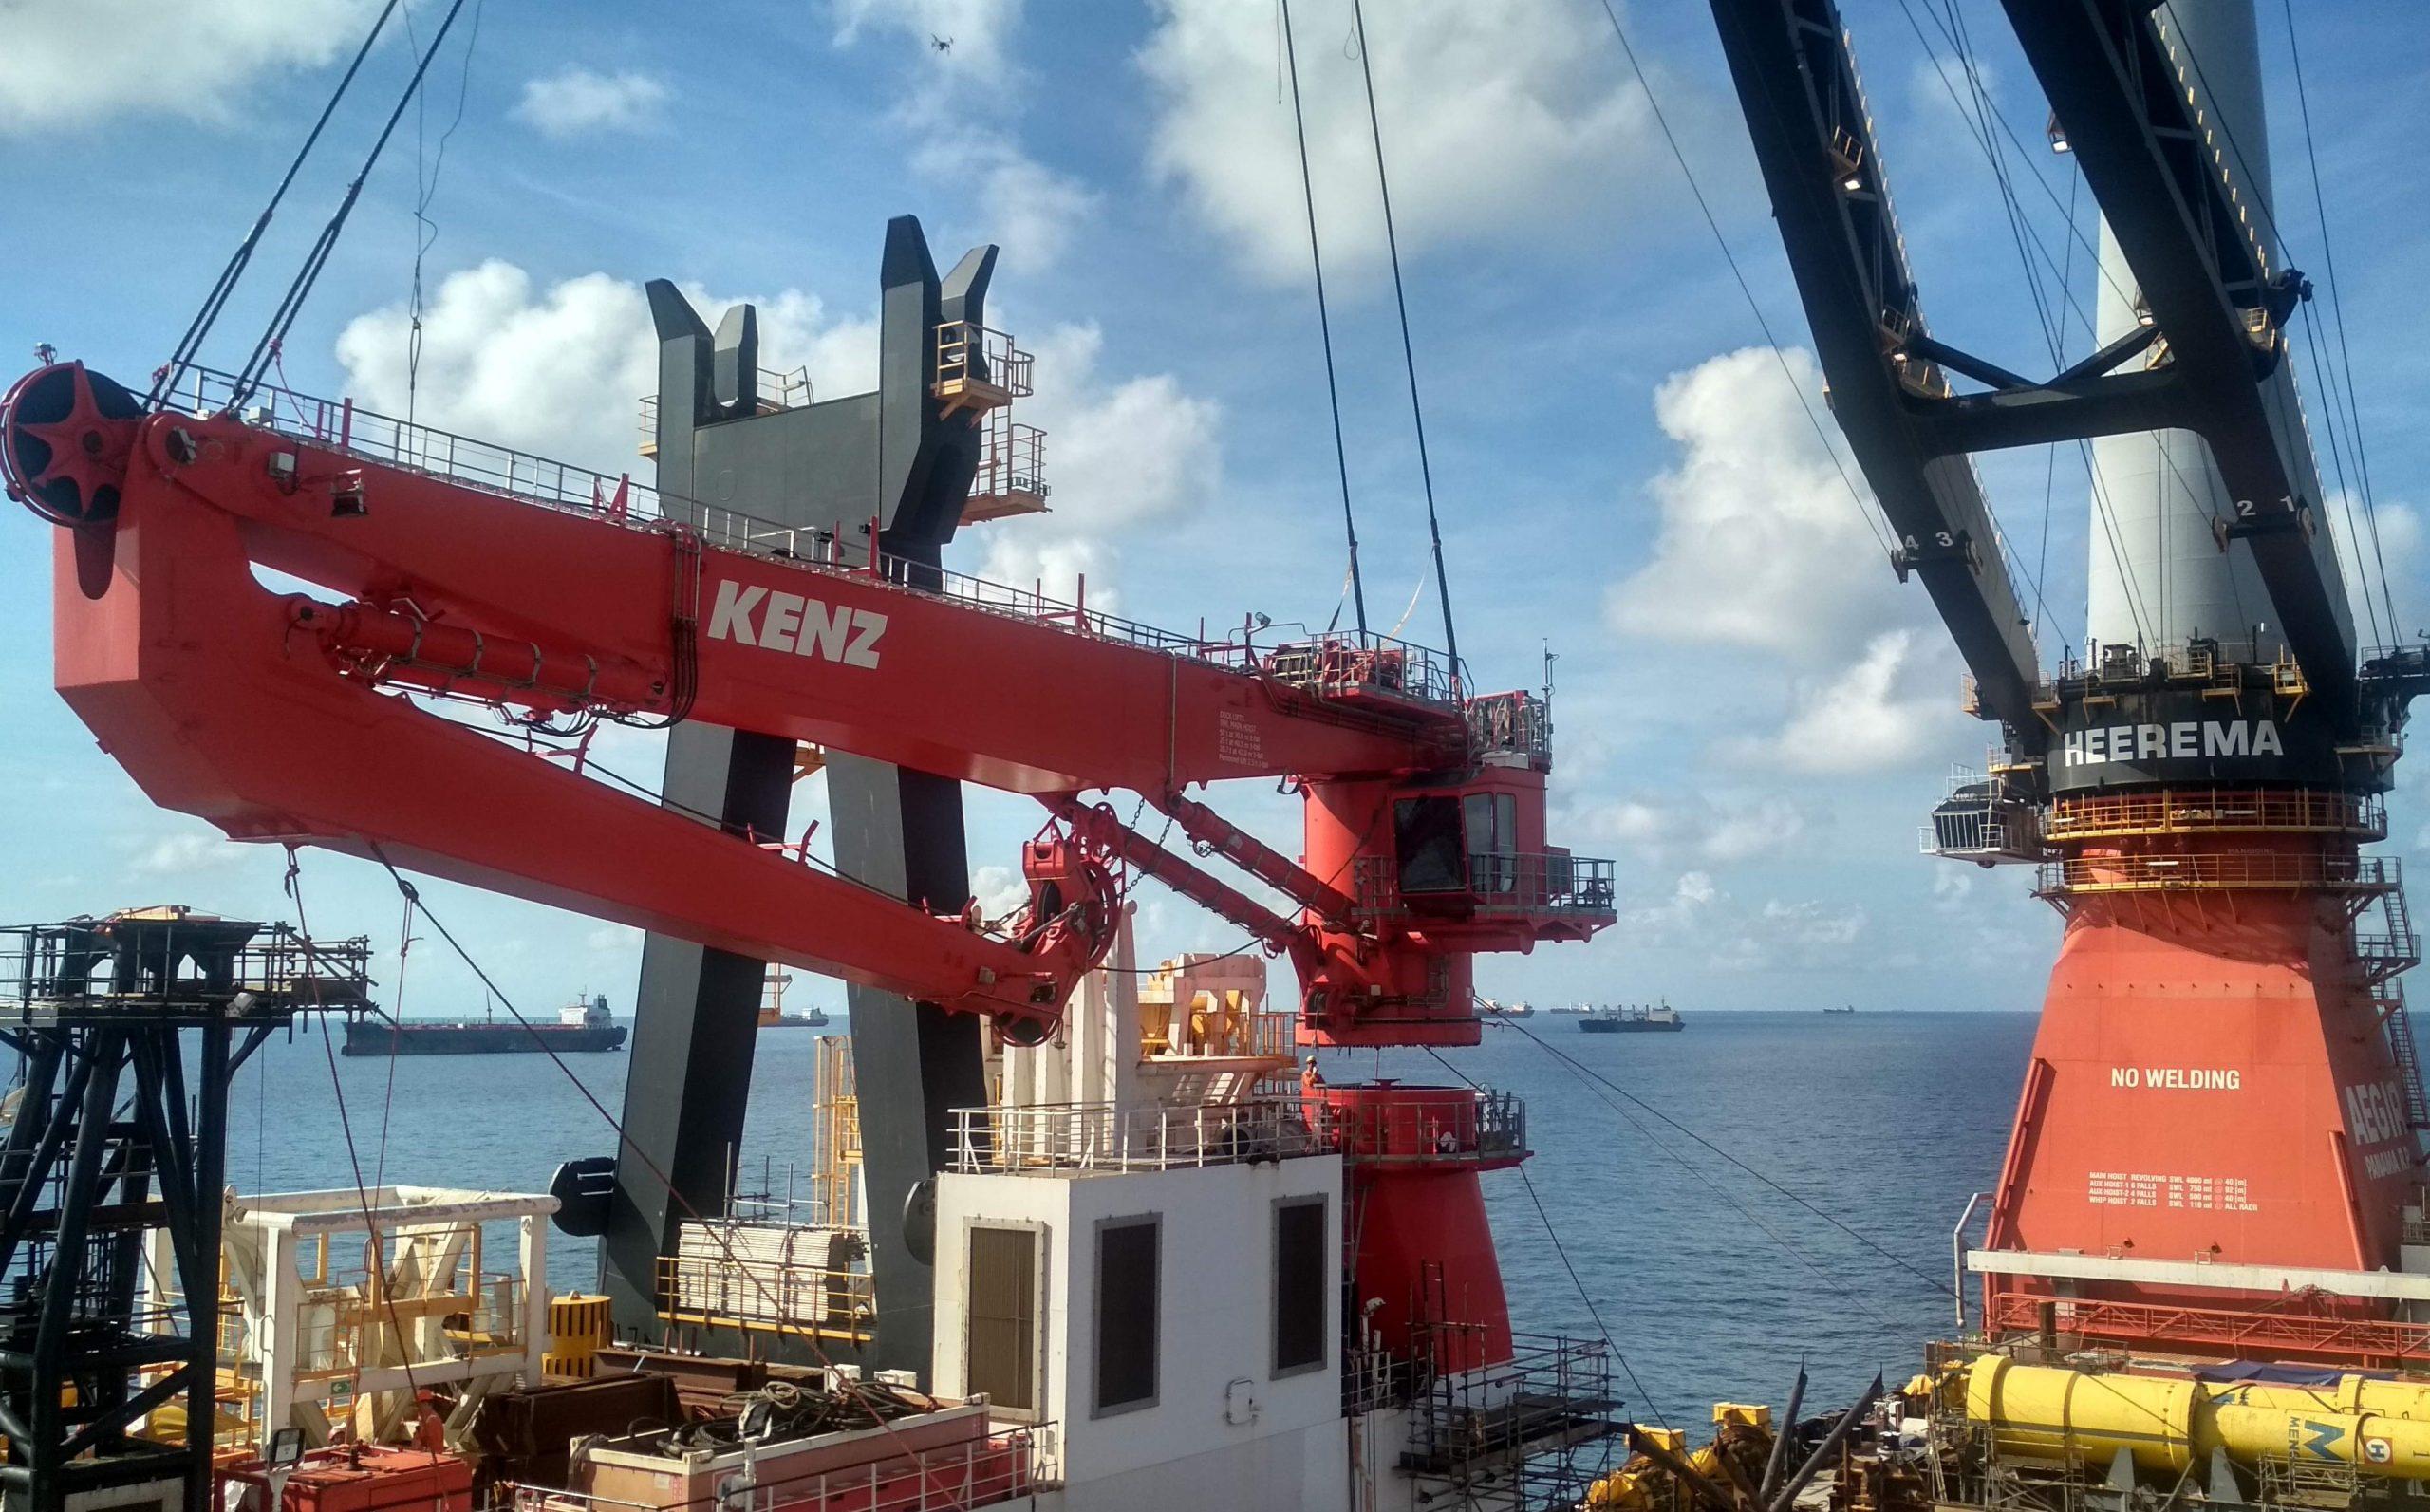 Knuckle boom crane installation o/b Heerema's Aegir